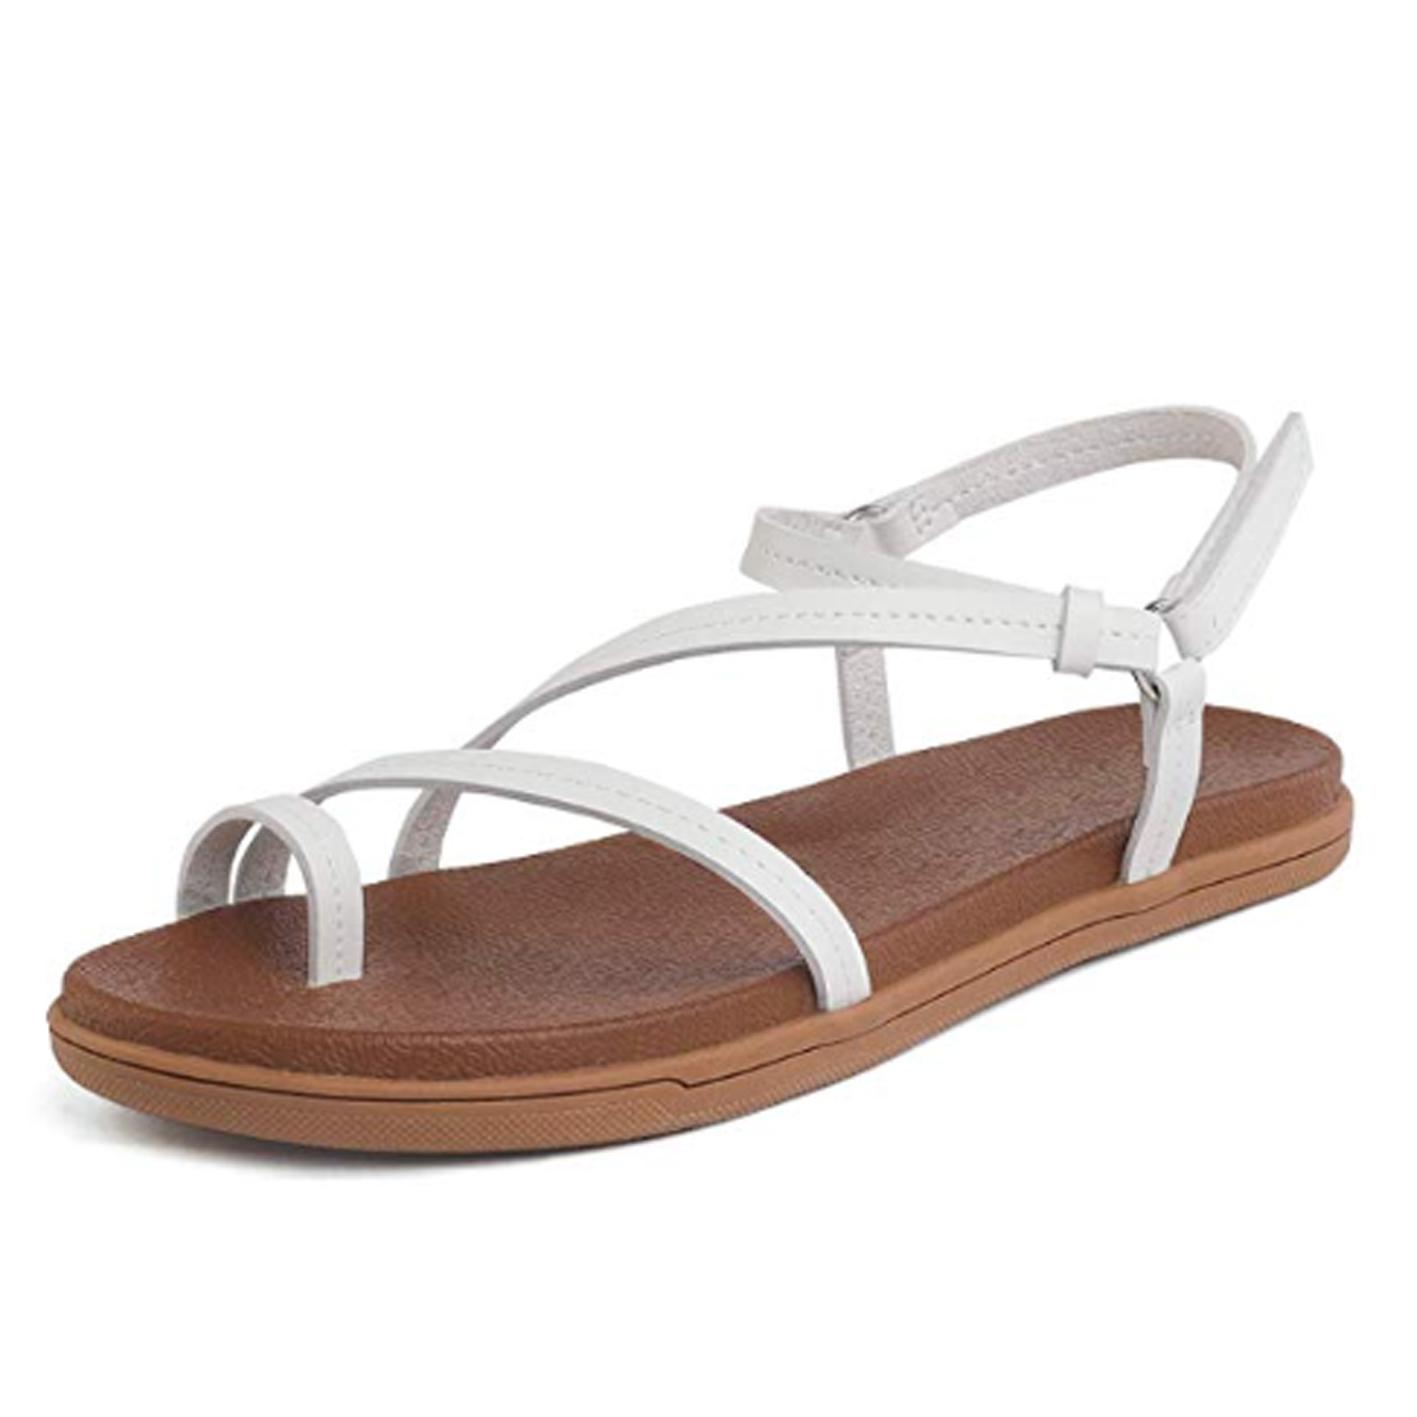 DREAM PAIRS Women's Slingback Flat Sandals